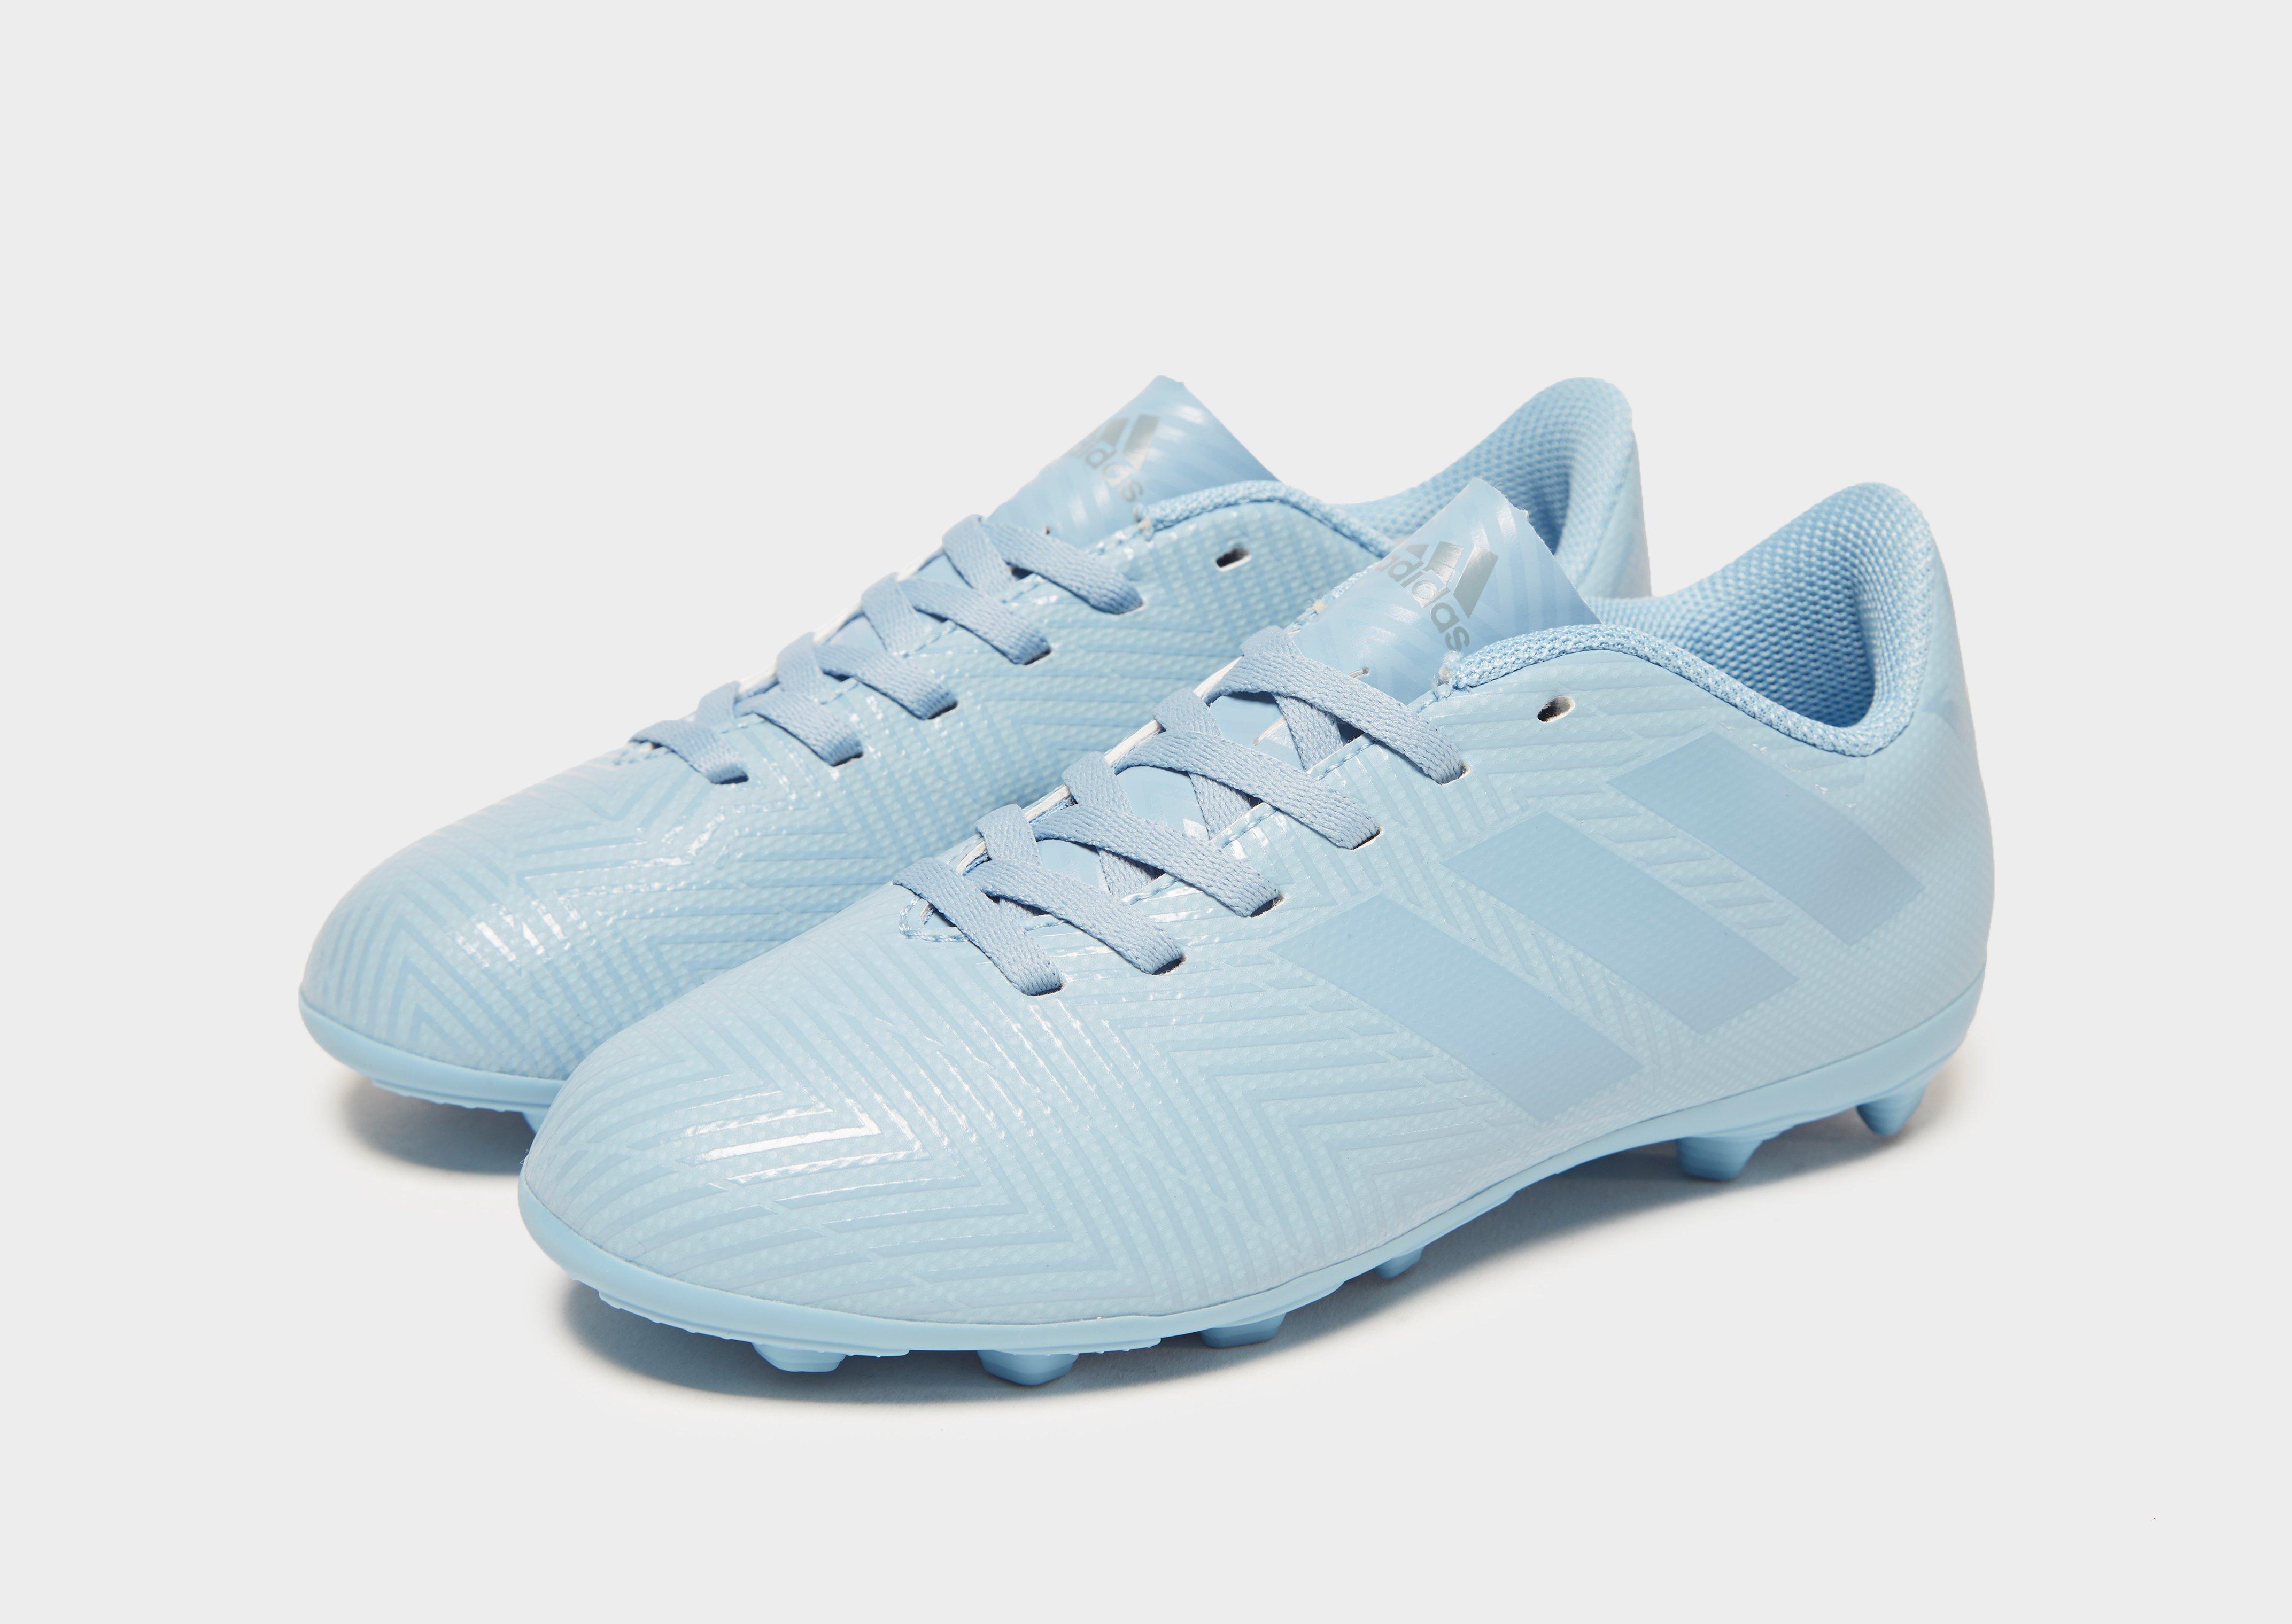 adidas Spectral Mode Nemeziz Messi 18.4 FG Children